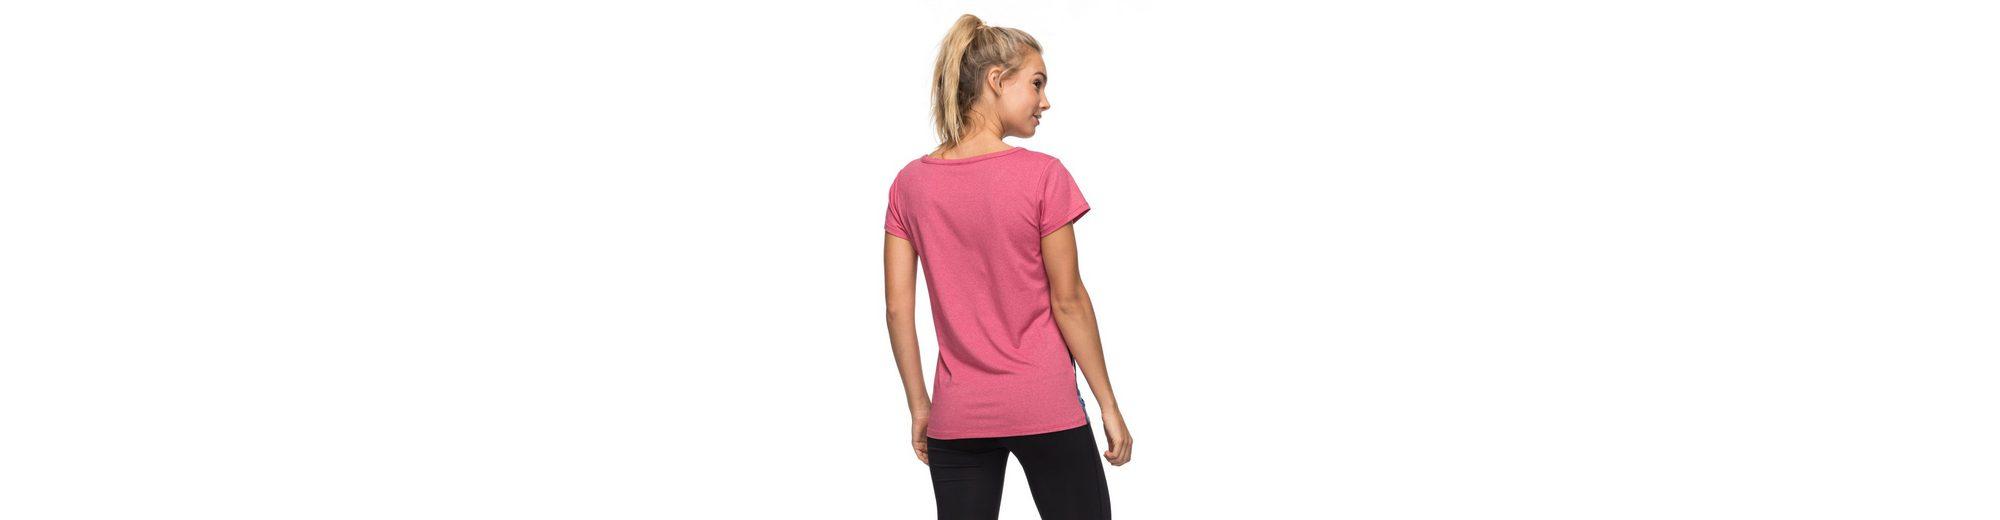 Roxy Funktionelles T-Shirt Beat The Rythm Billige Browse Erstaunlicher Preis wzrwlE0J